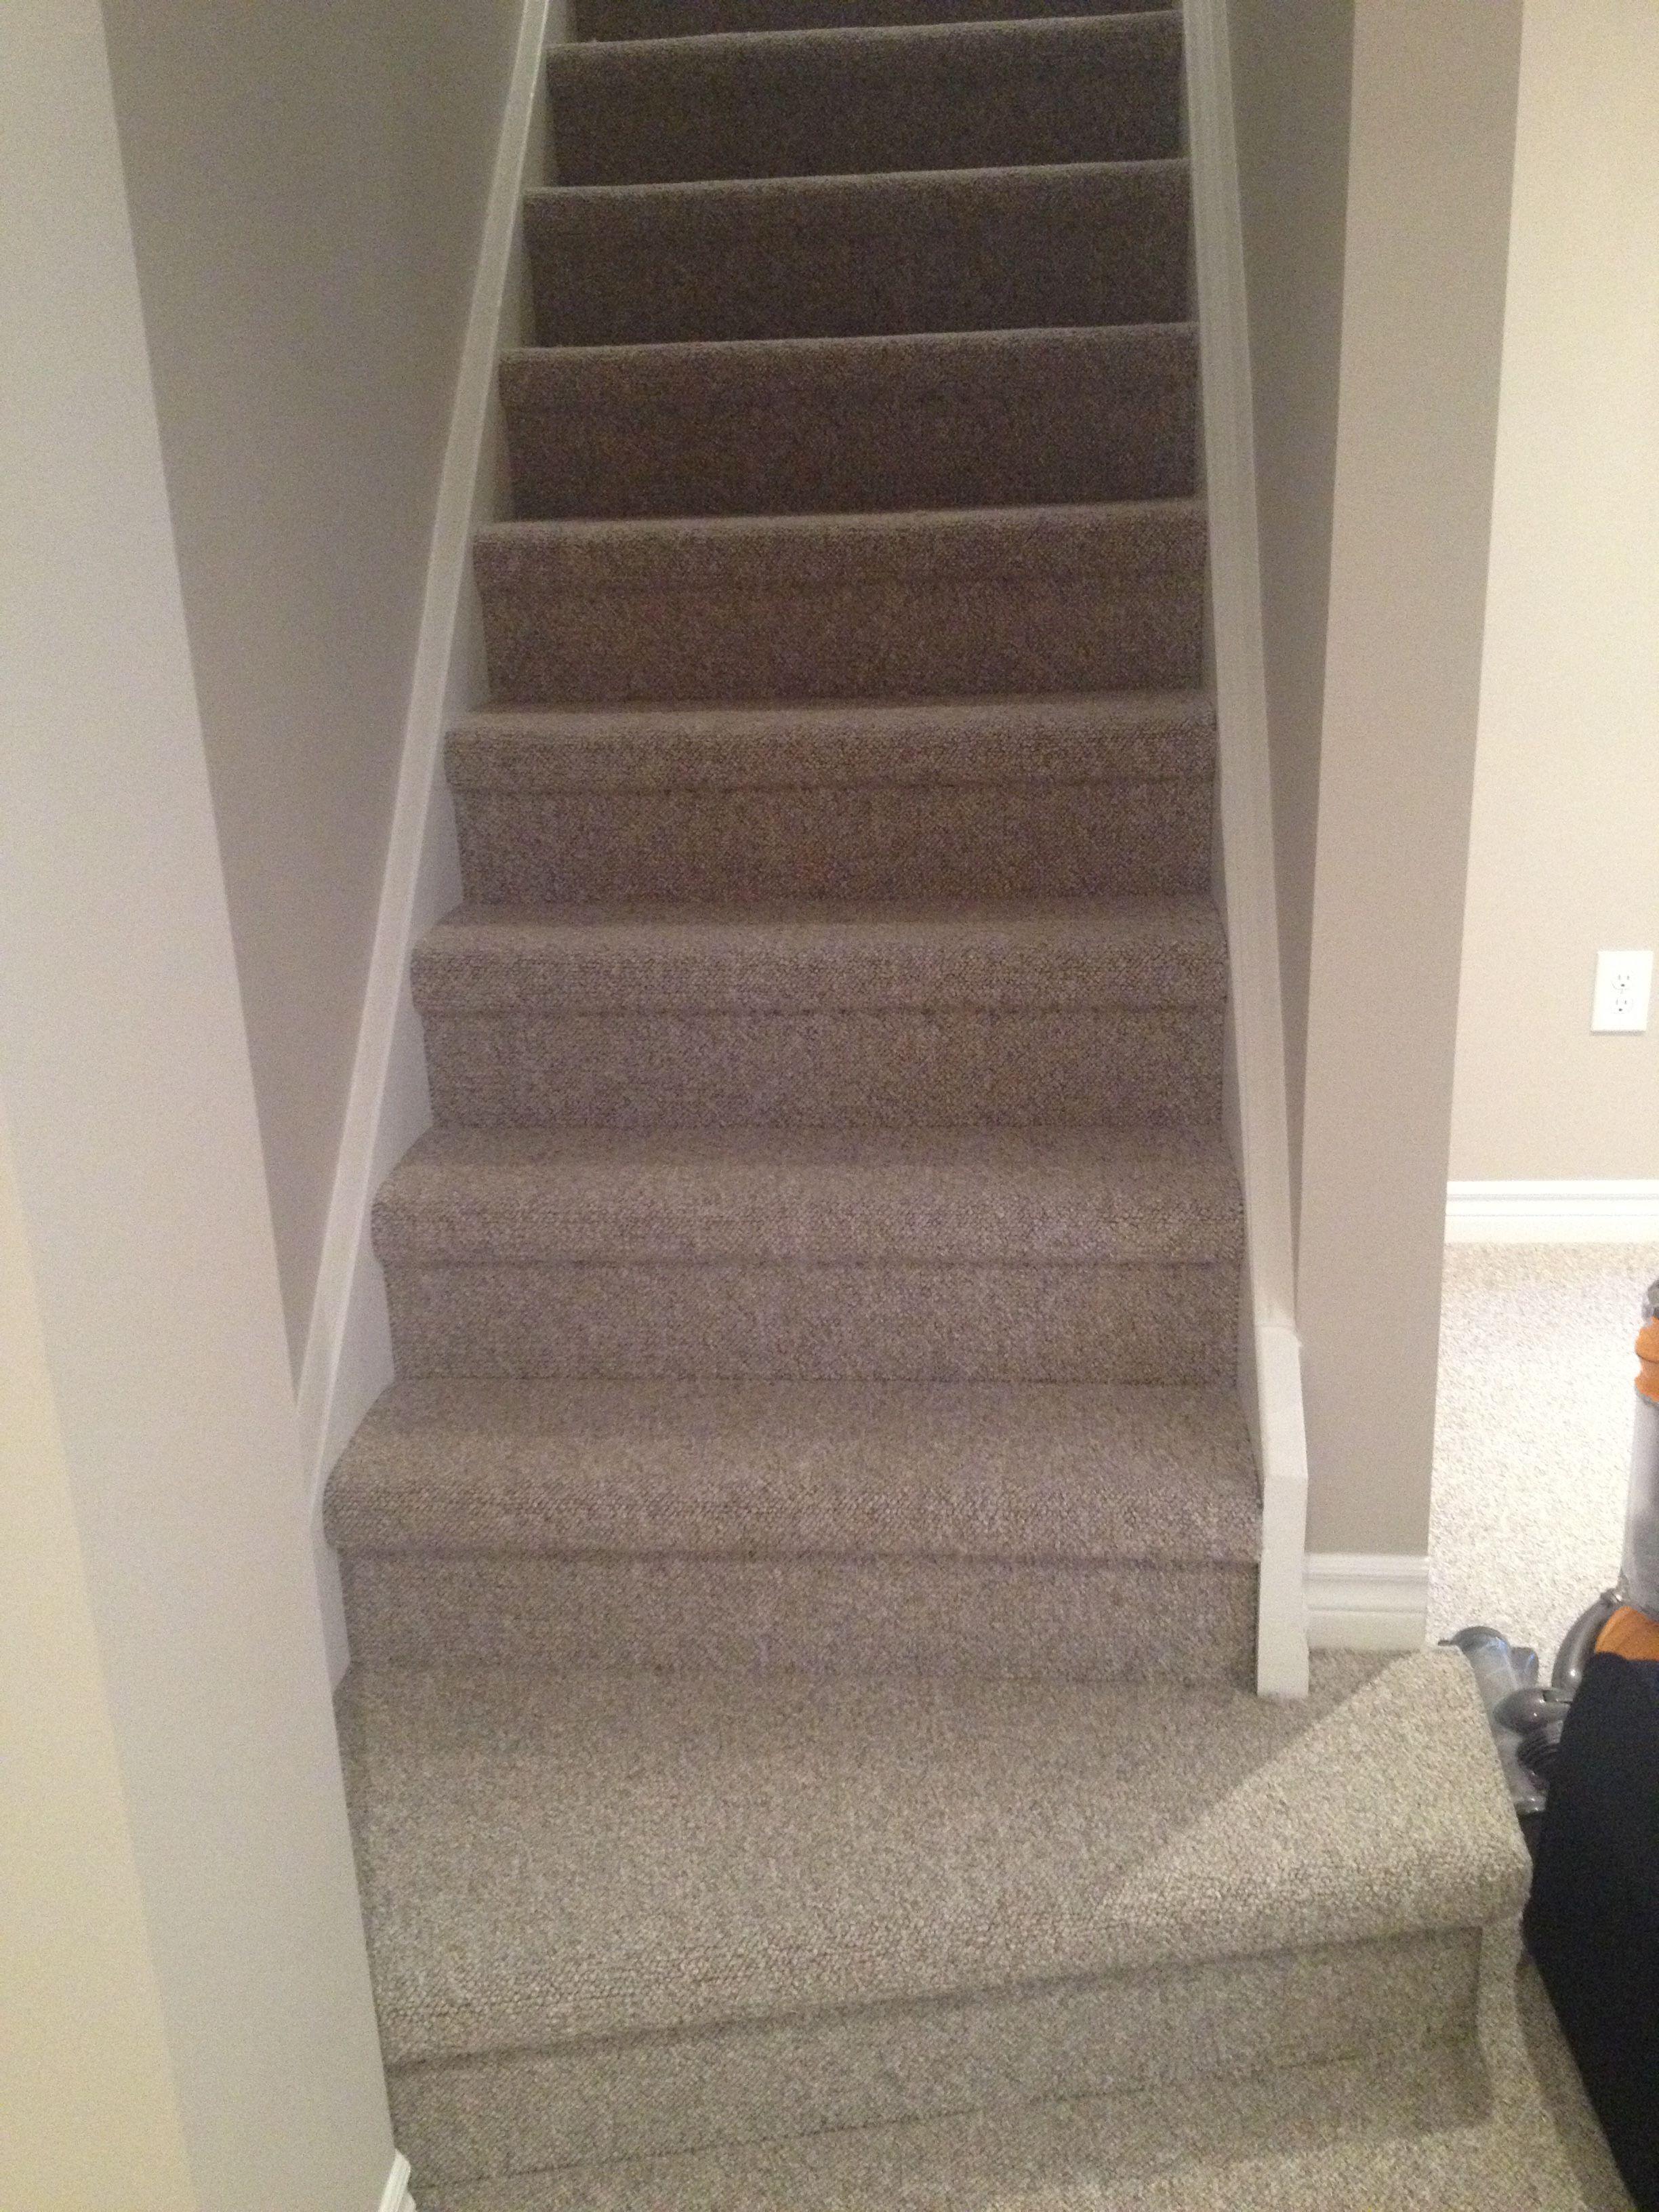 Berber Carpet On Stairs Carpet Stairs Berber Carpet